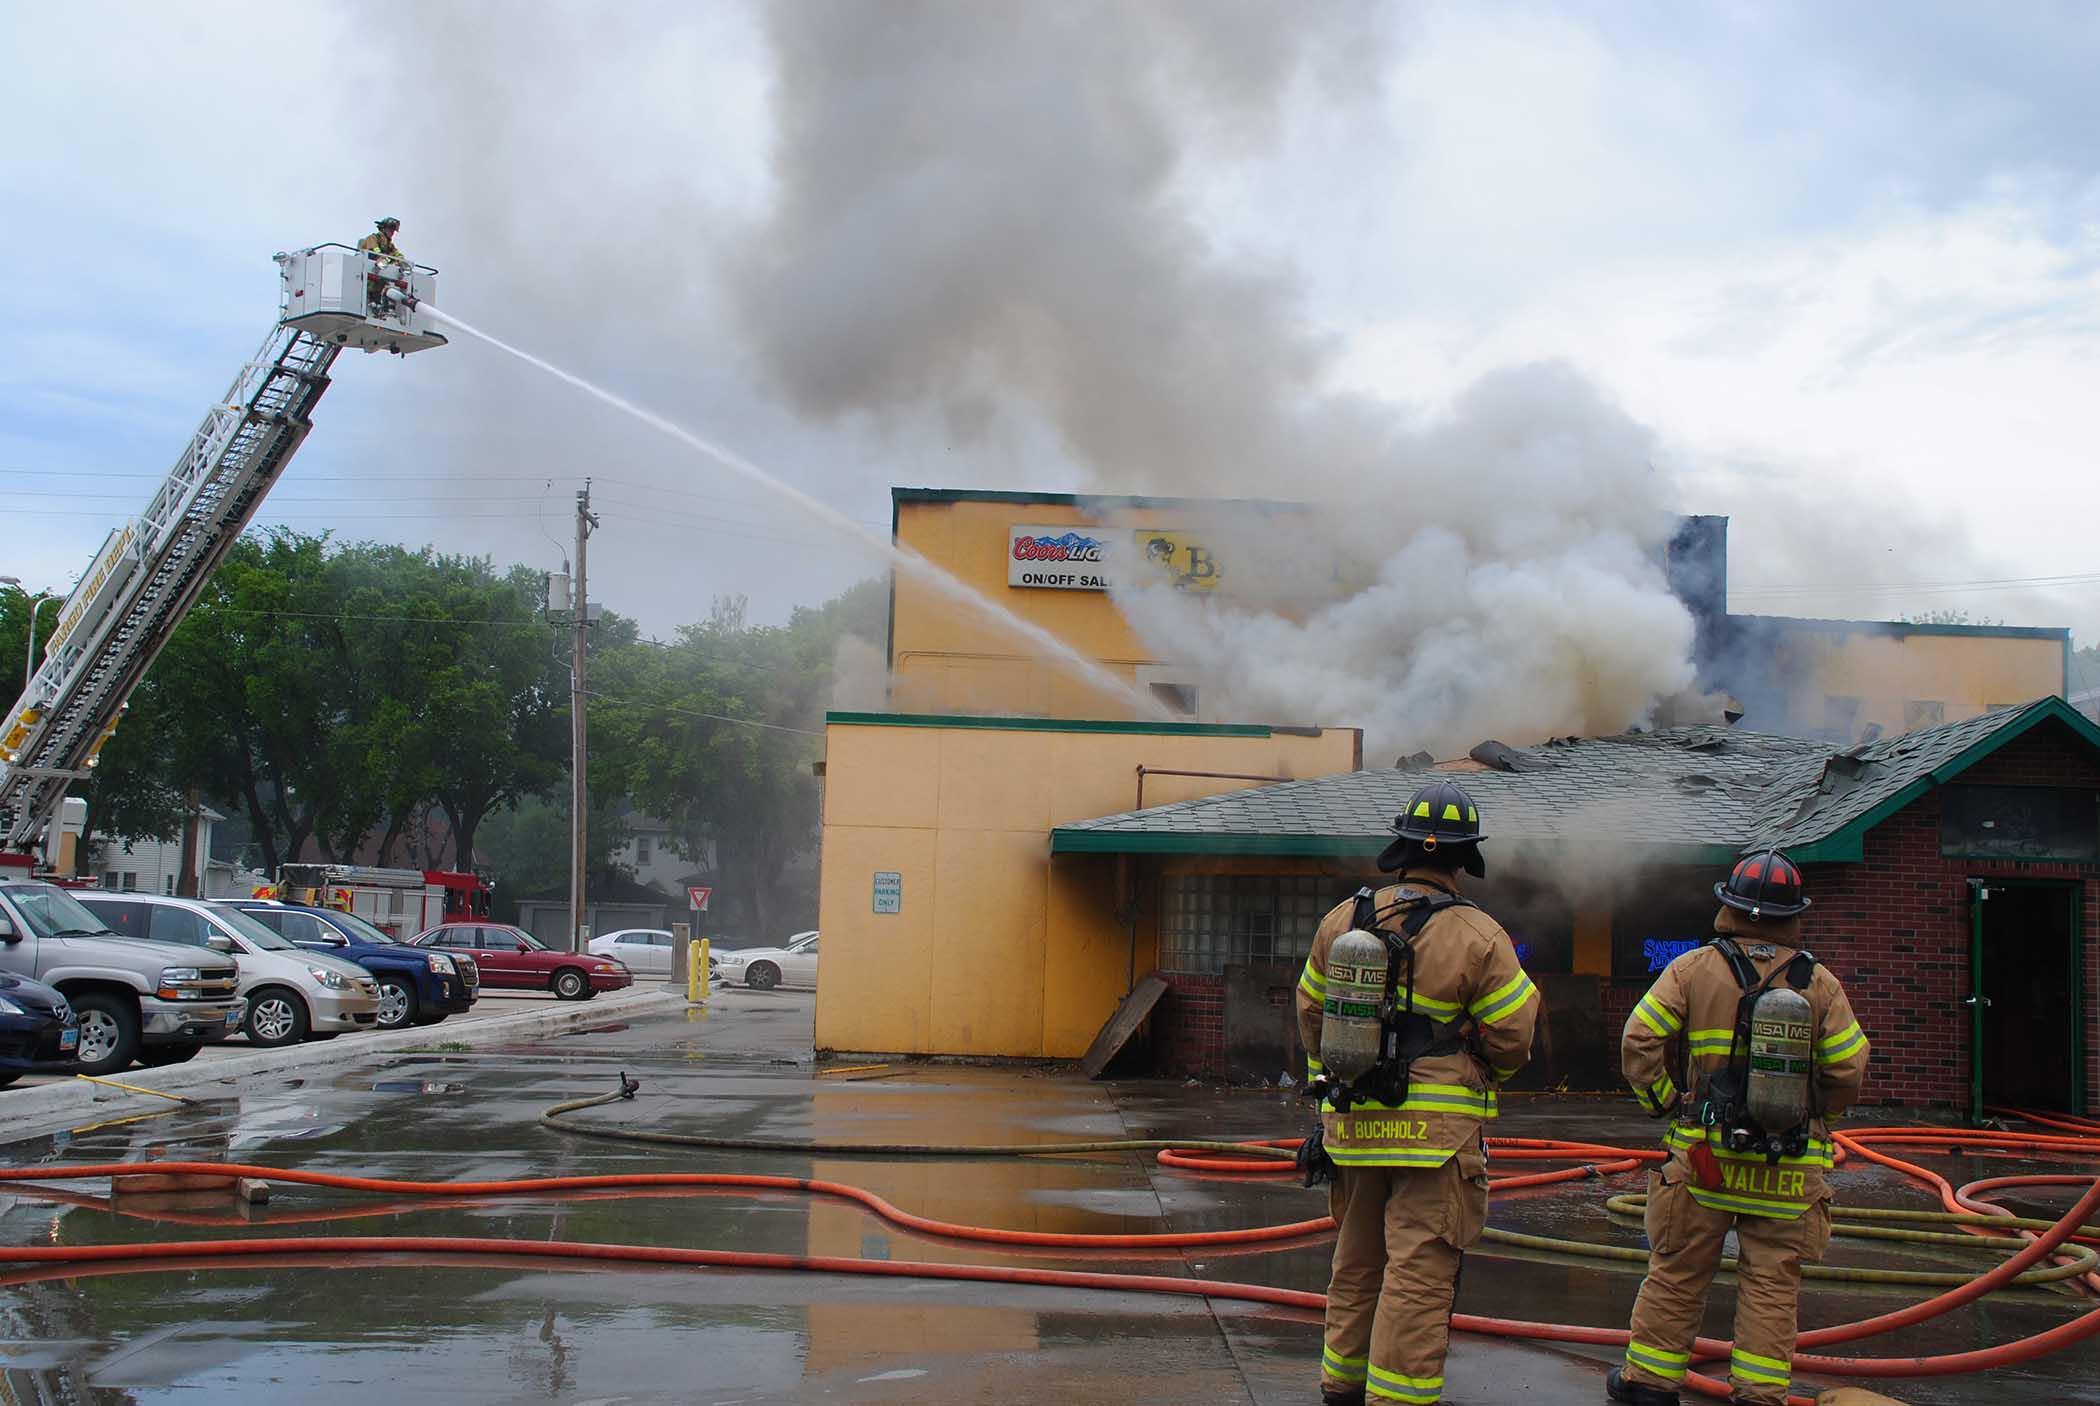 Firefighters battling Bison Turf blaze - photo by C.S. Hagen